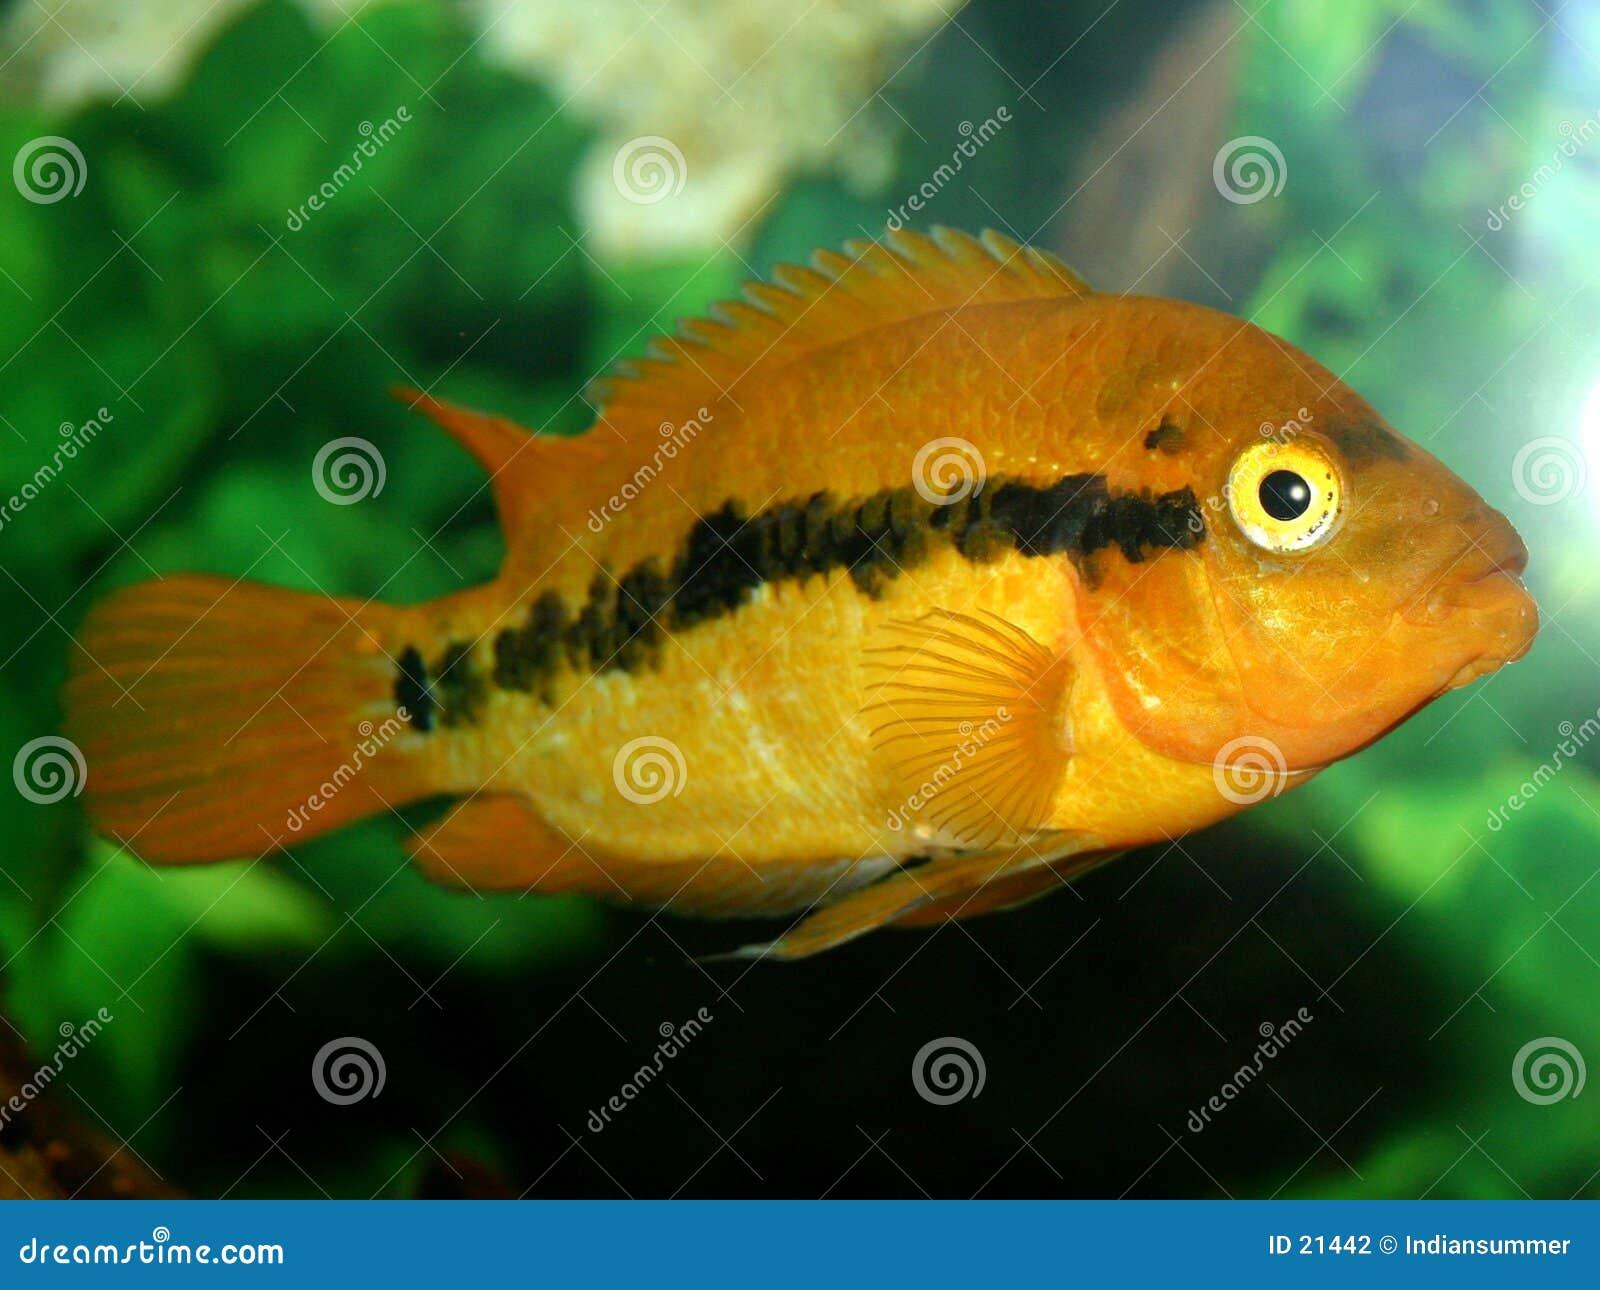 Fish series III